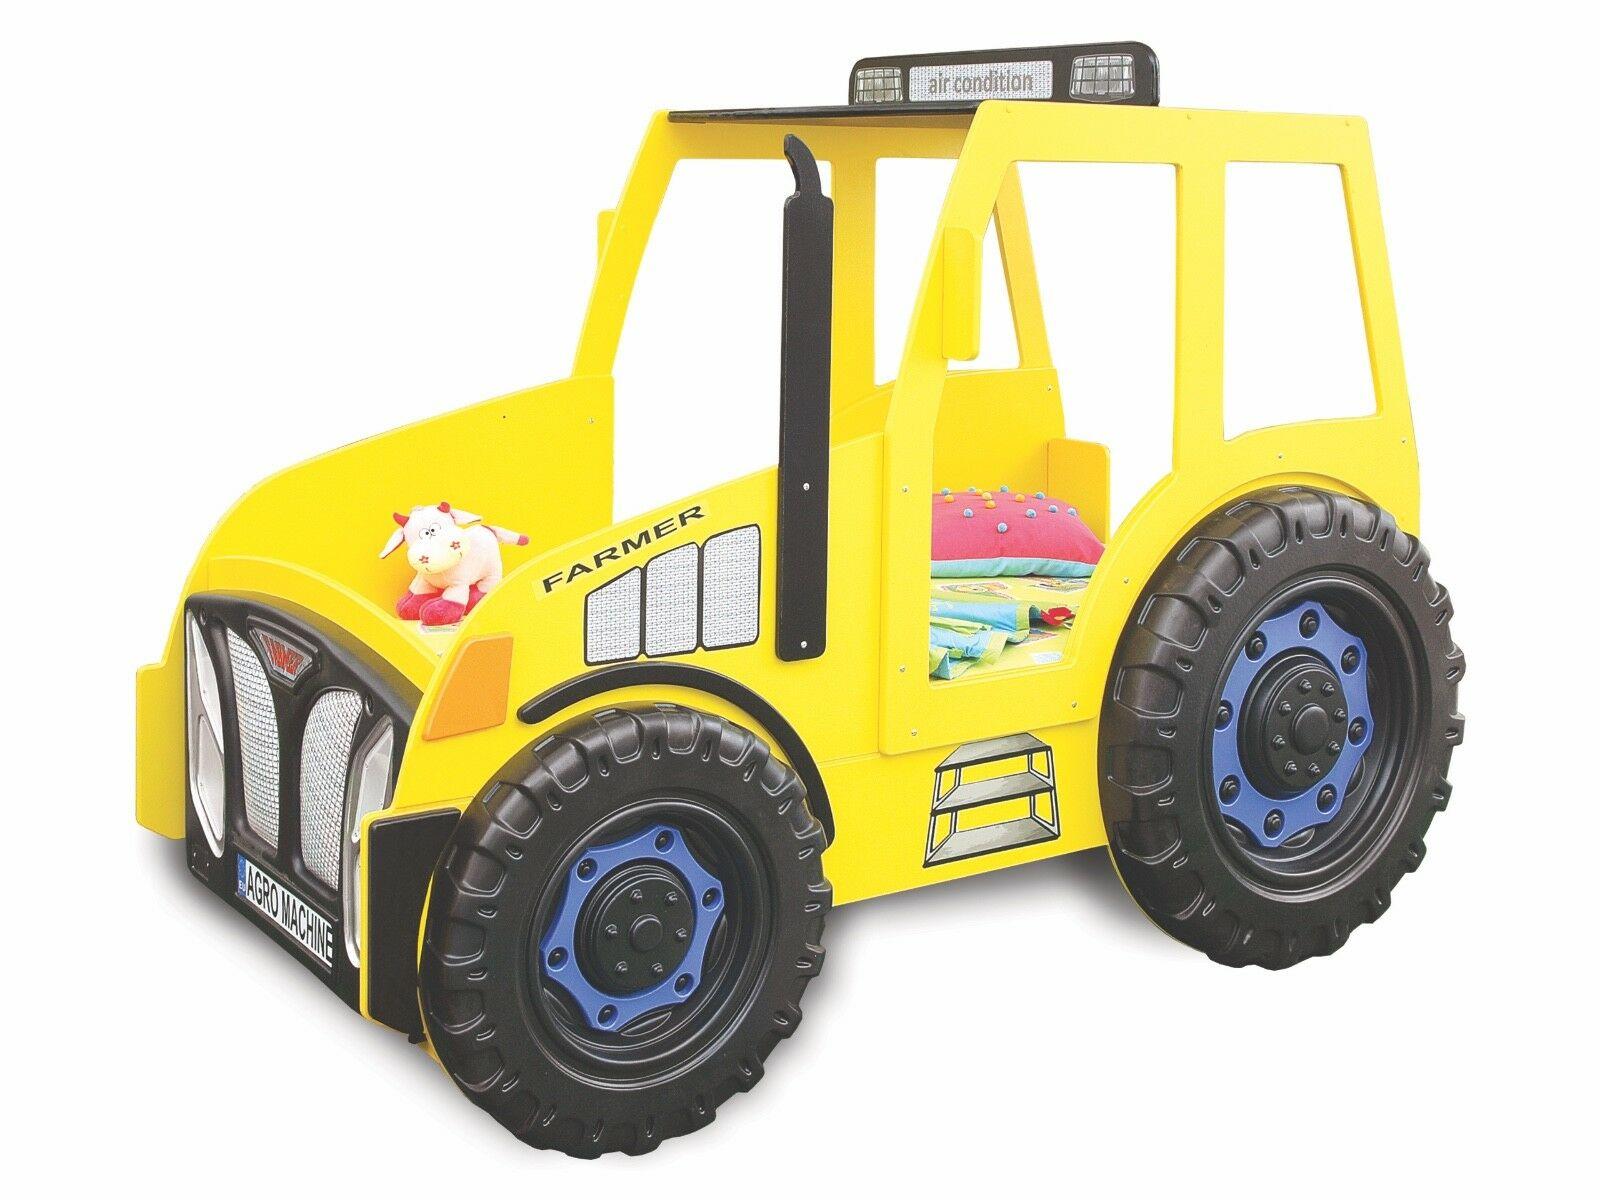 Kinderzimmer Bett Kinderbett Traktor In Blau Grun Rot Gelb Inkl